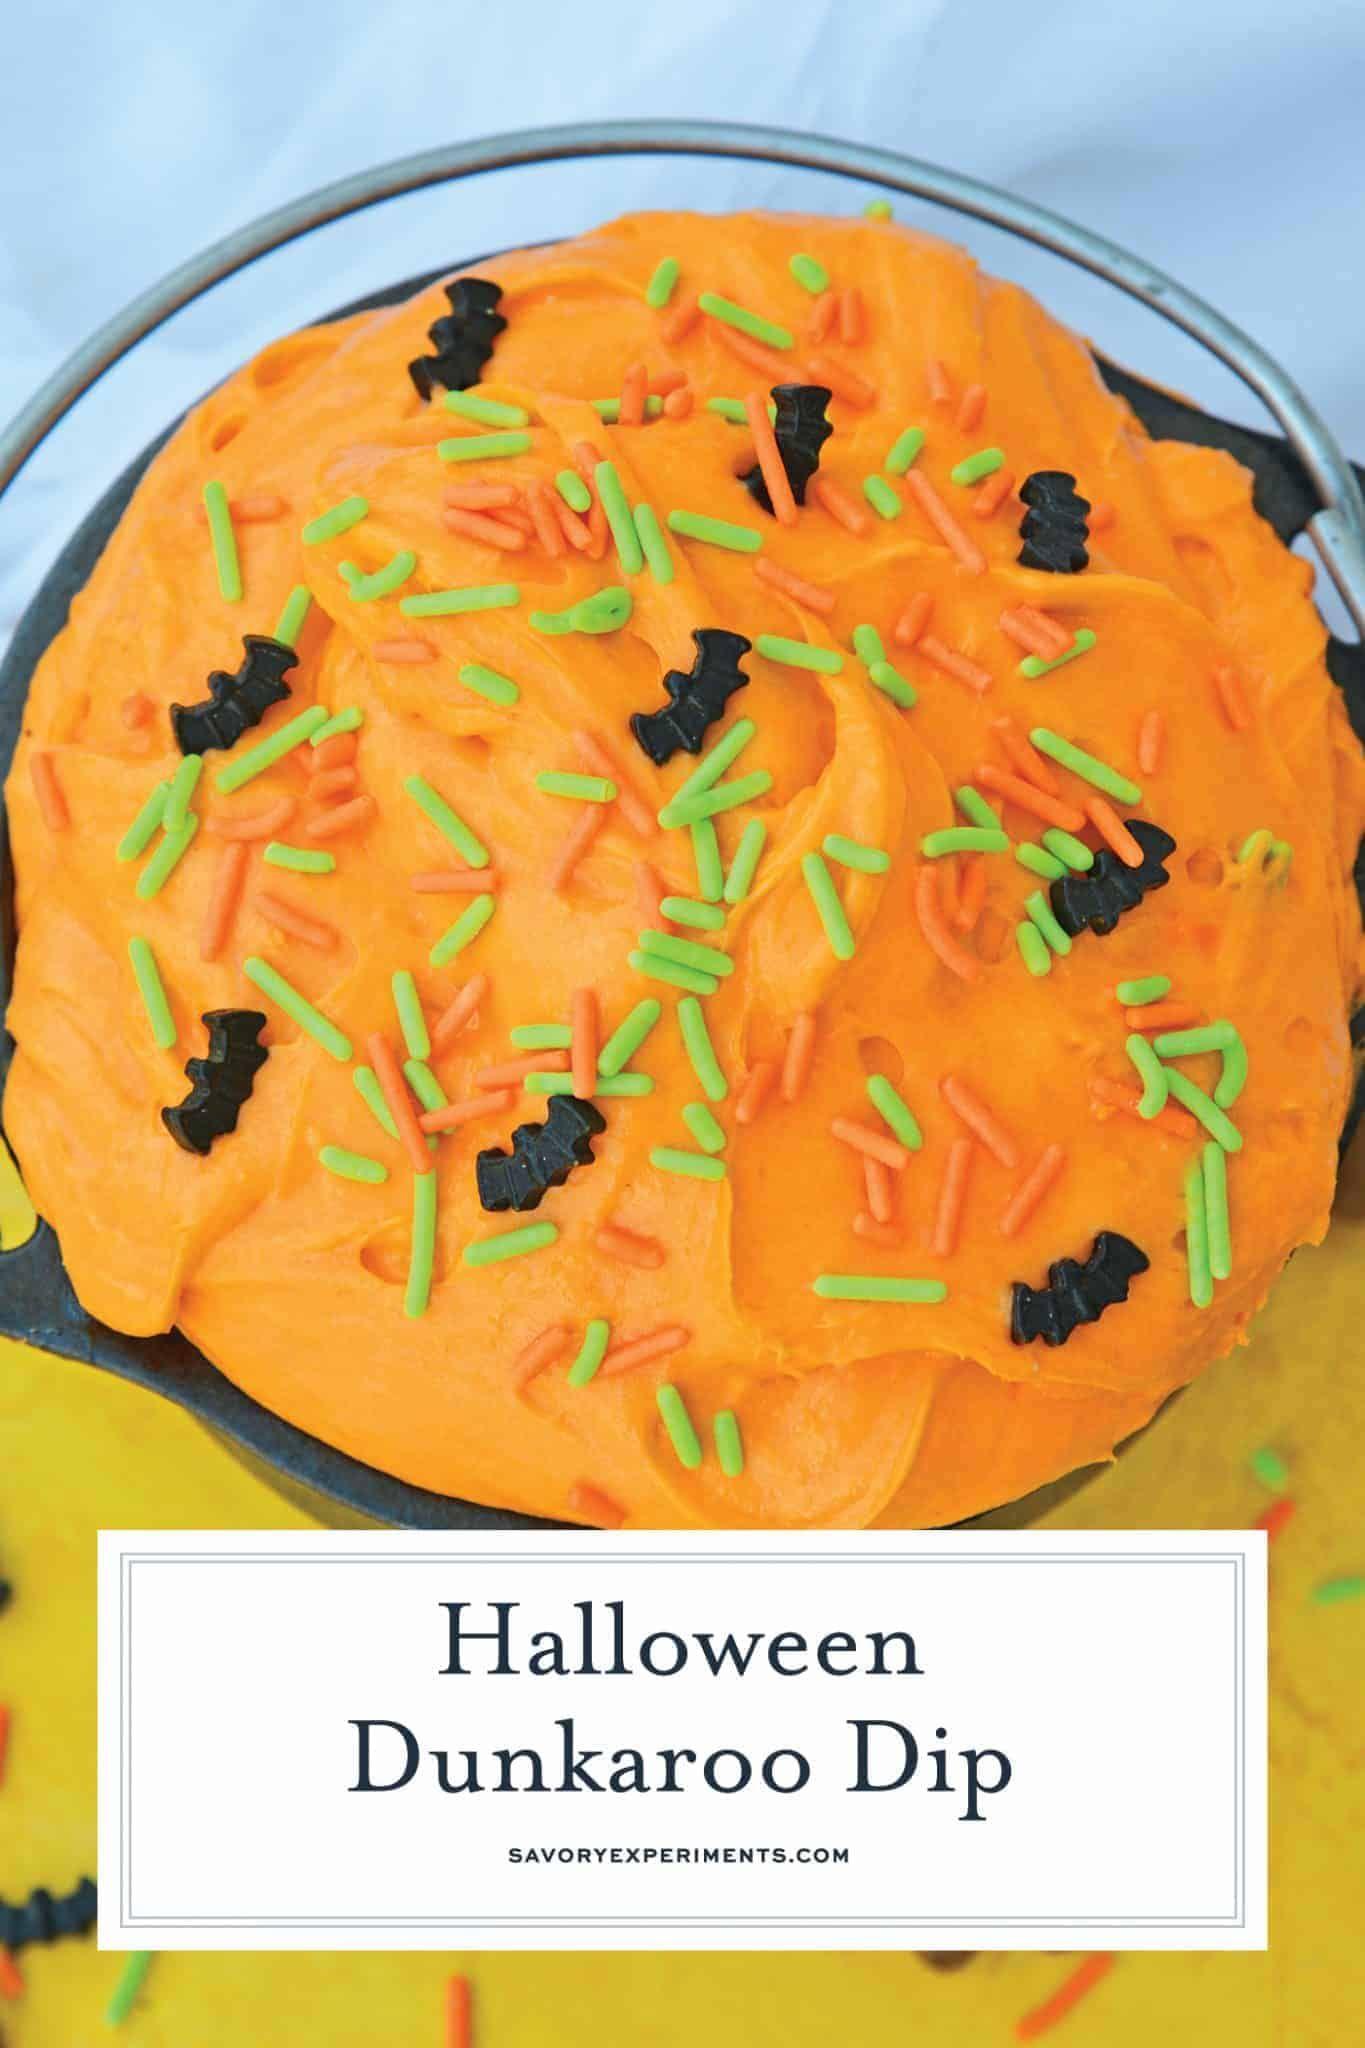 Halloween Dunkaroo Dip - Cake Batter Dip for Halloween